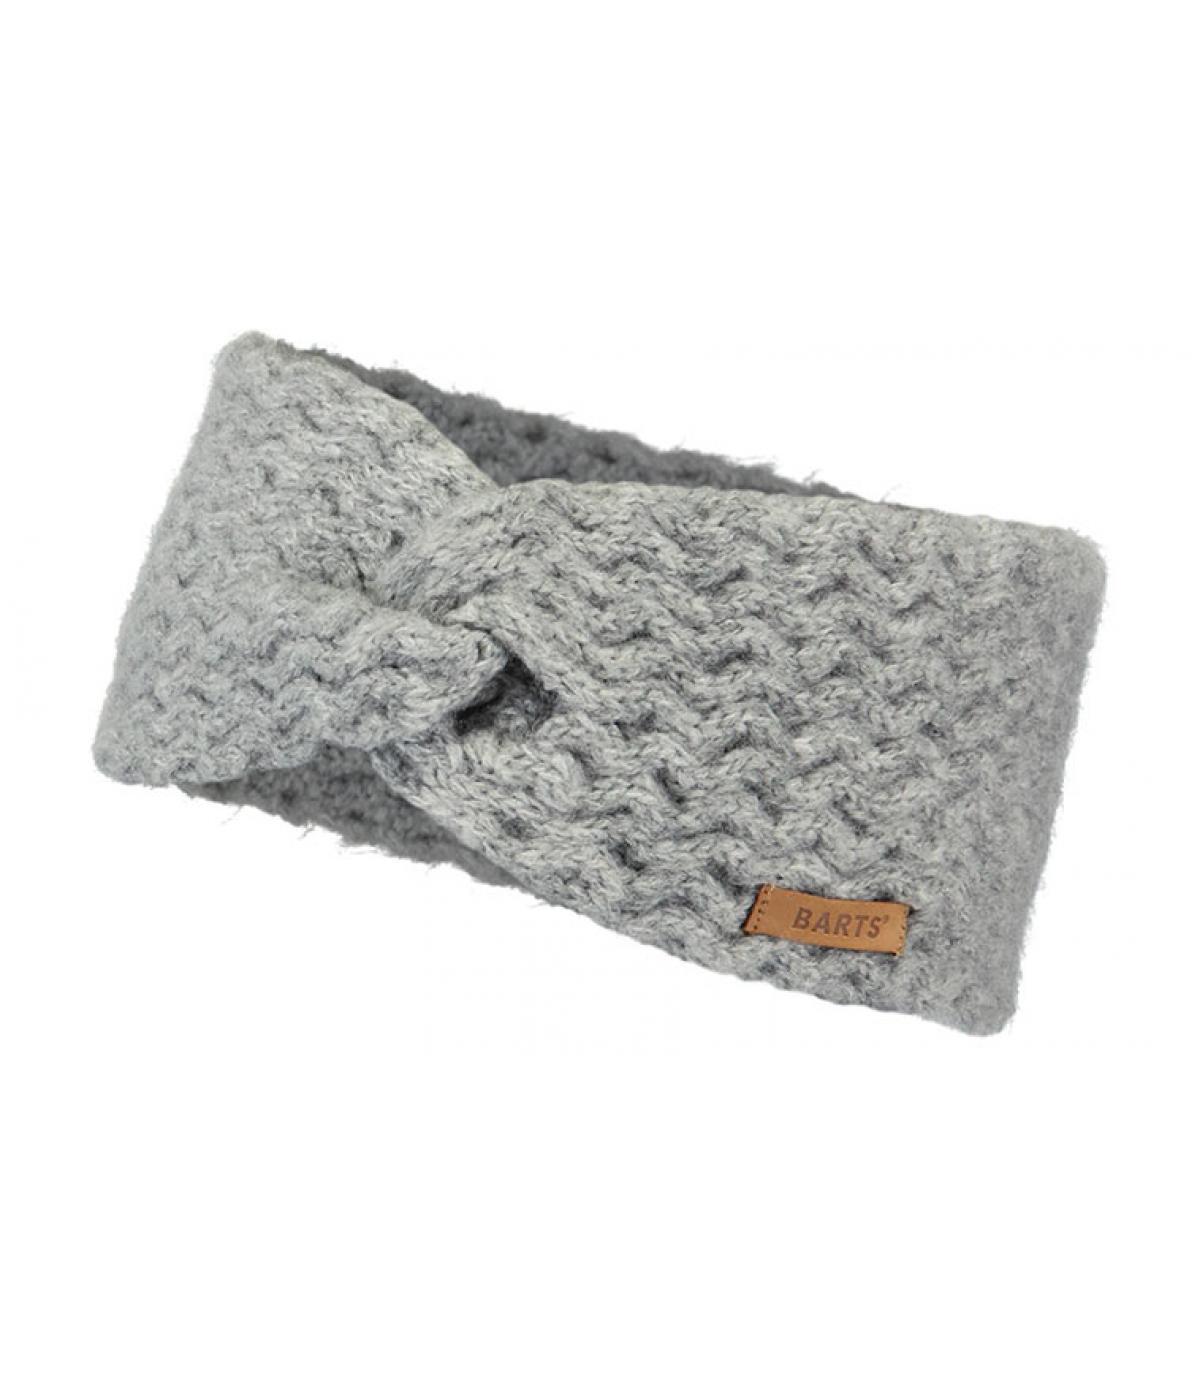 Details Kids Rozamond Headband heather grey - afbeeling 2